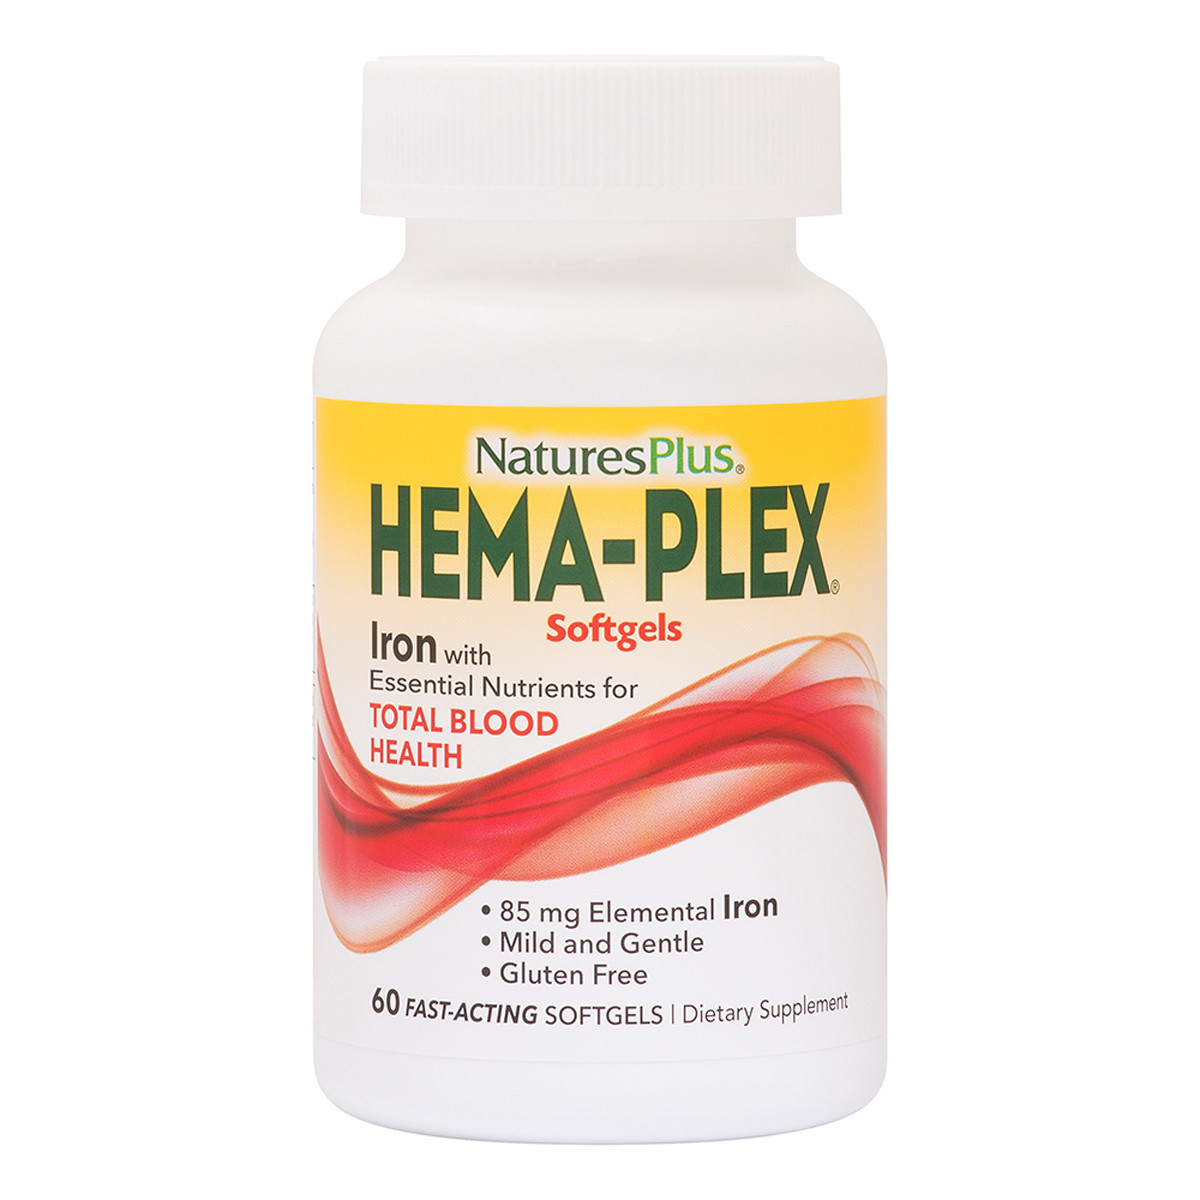 Комплекс с железом Hema-Plex, Iron, Nature's Plus, 60 Мягких Желатиновых Капсул